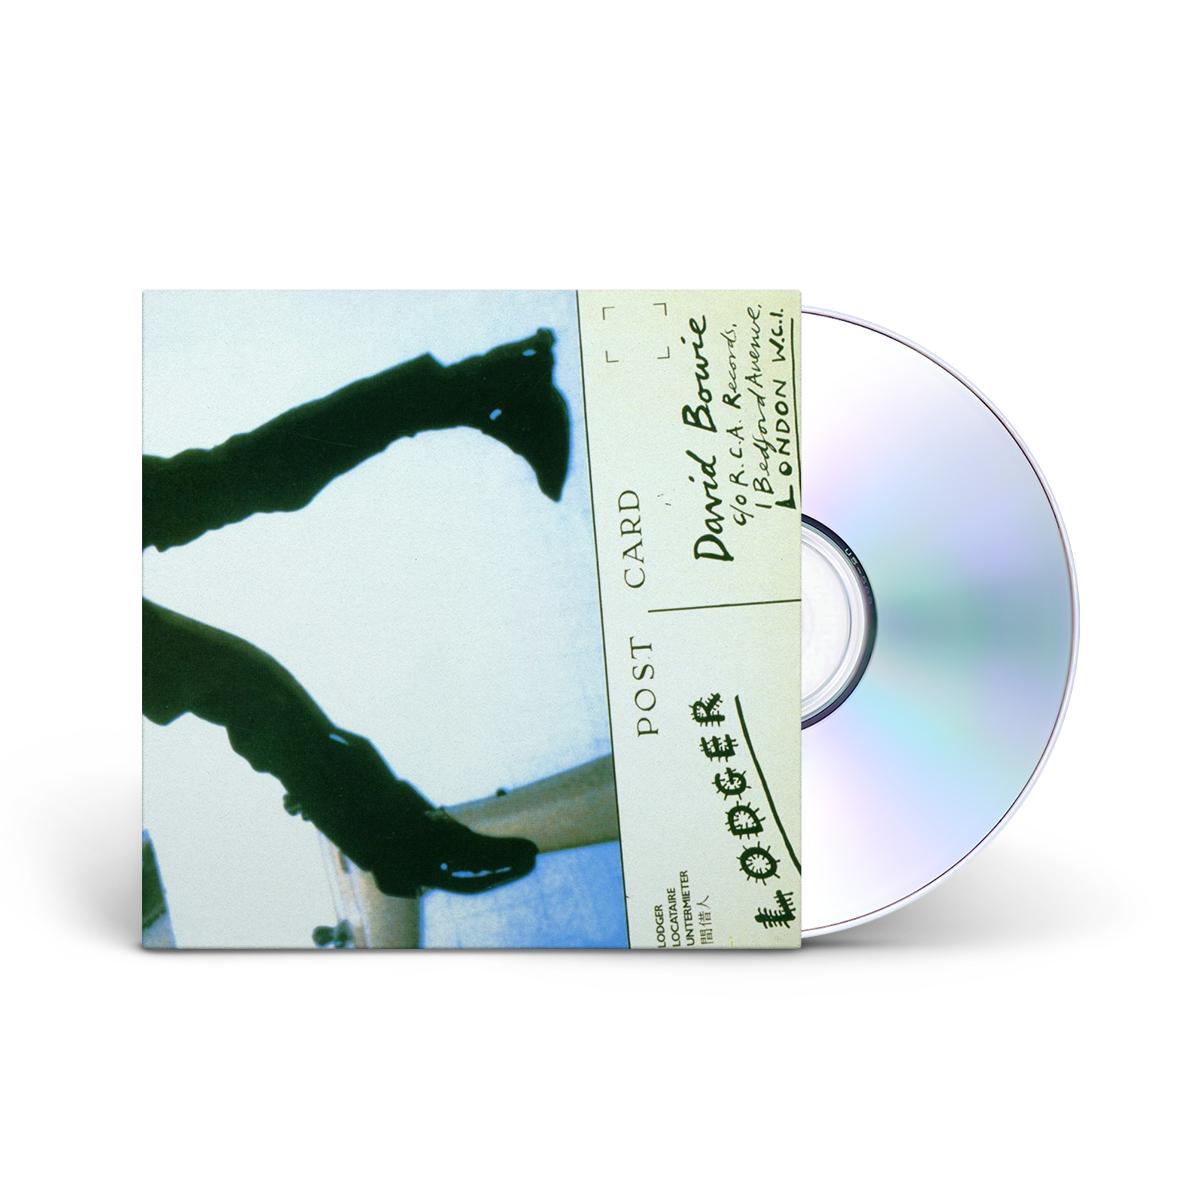 David Bowie Lodger CD